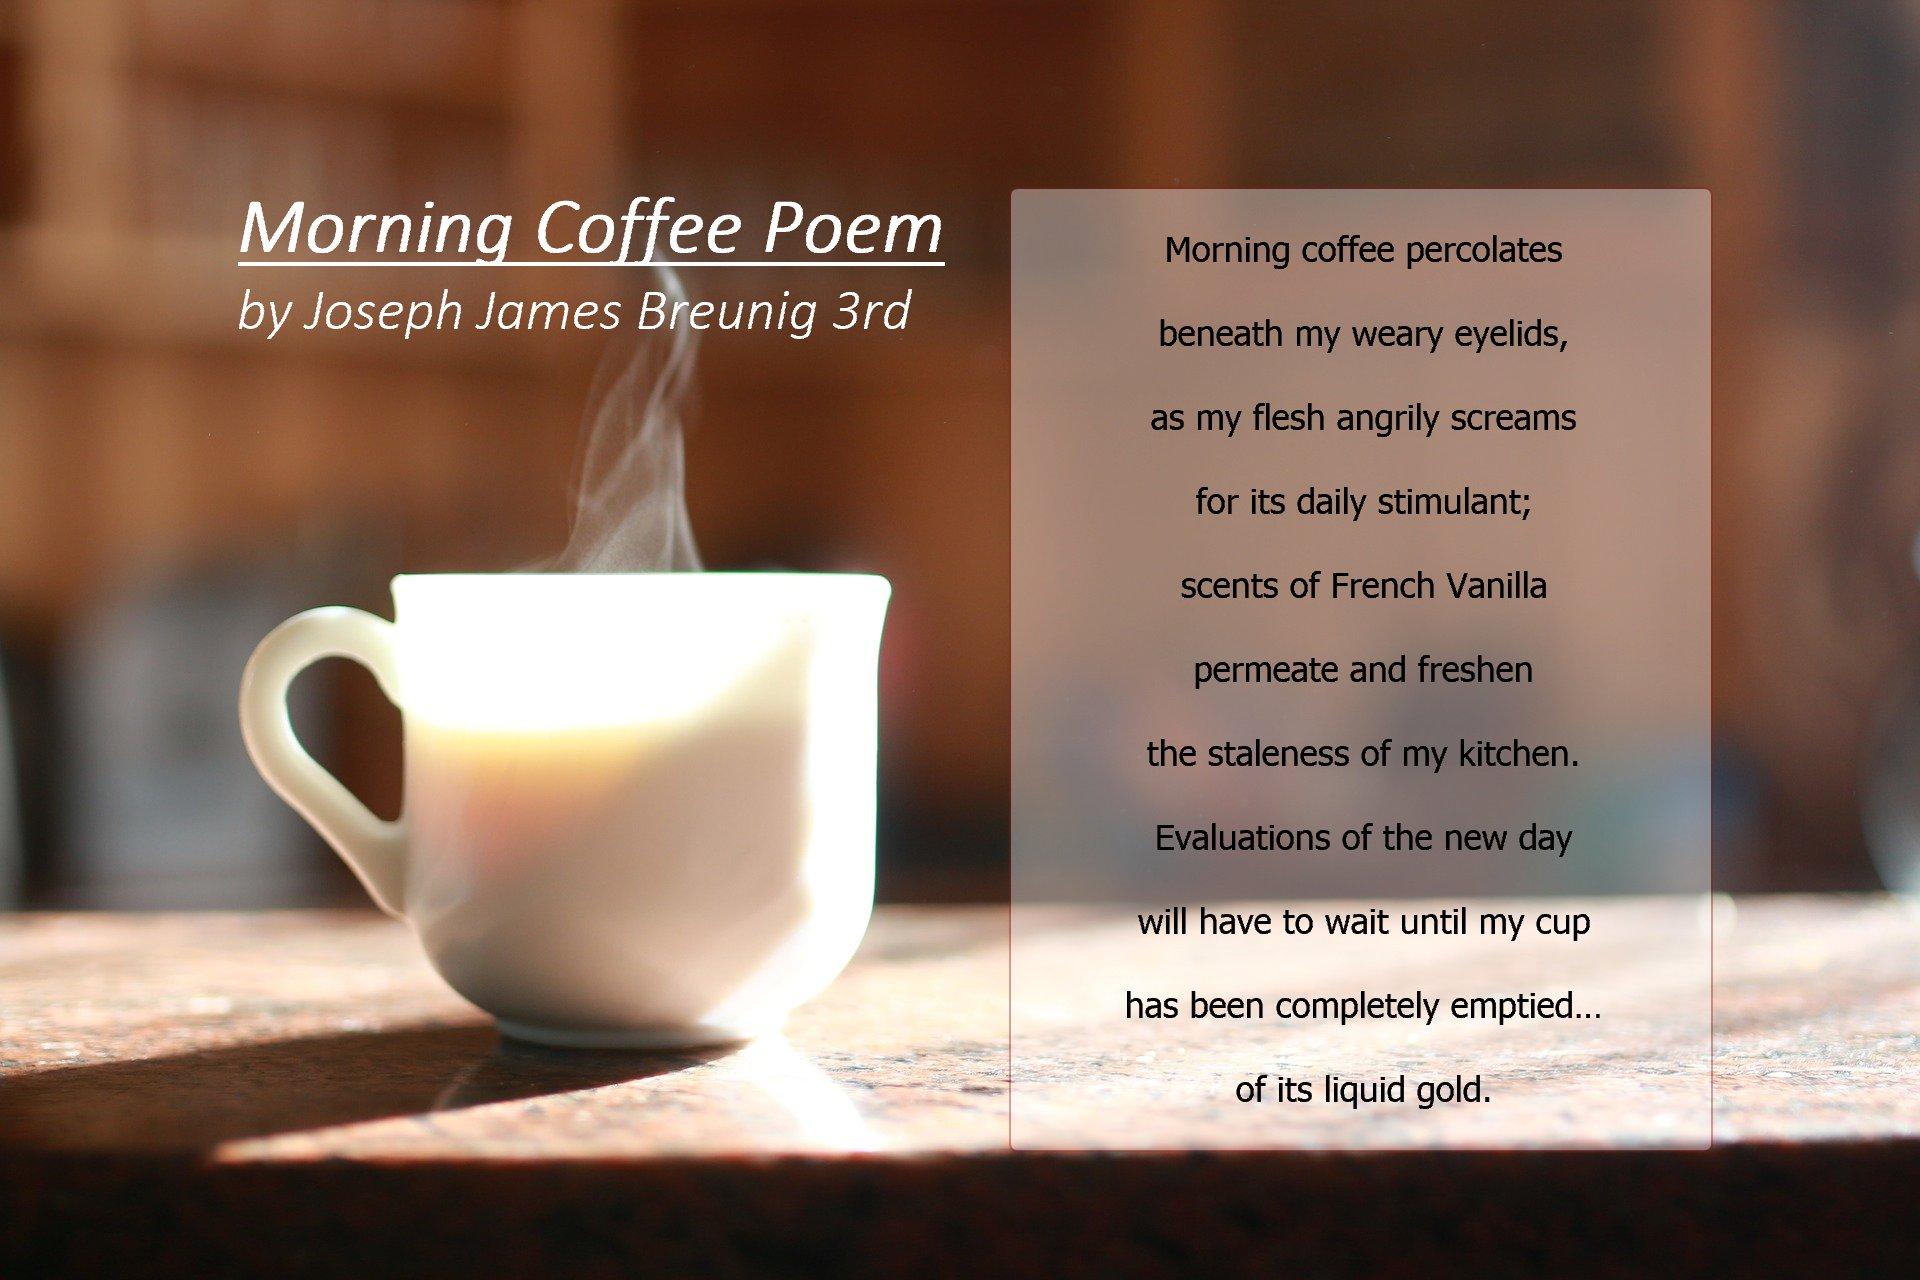 Good Morning Coffee Poem 3